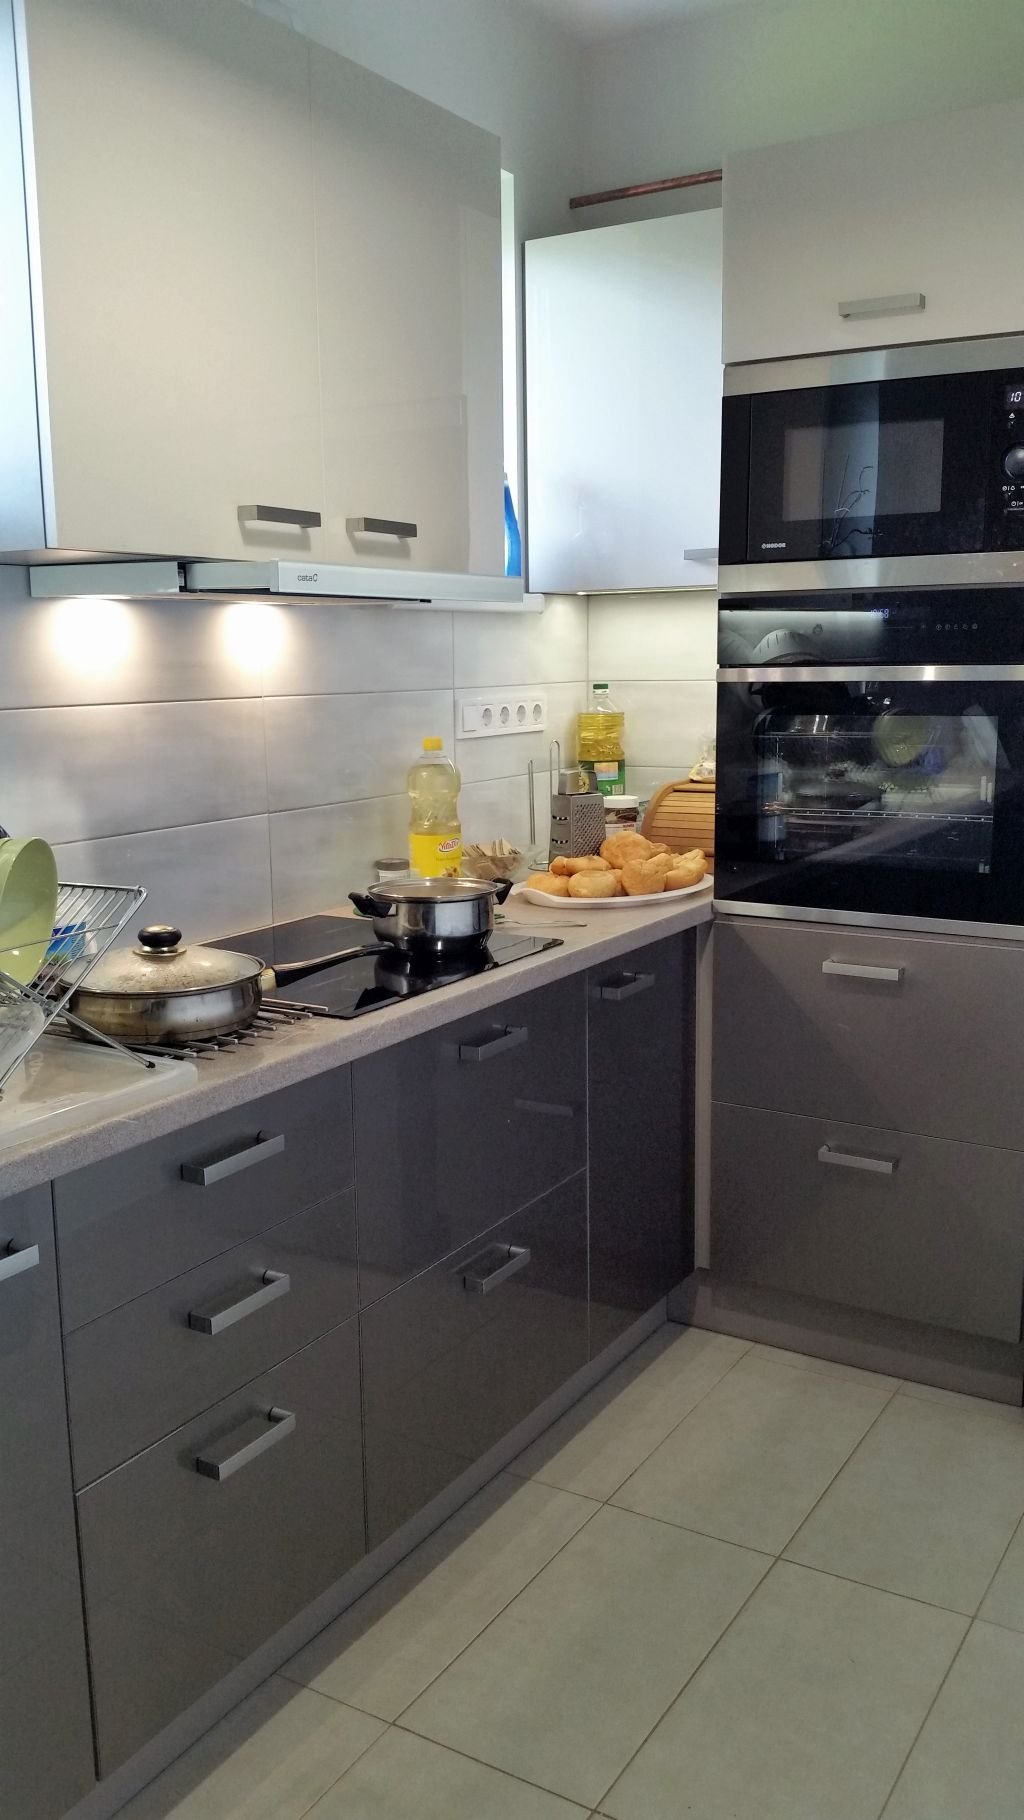 Kis konyha fotók – Minos Design